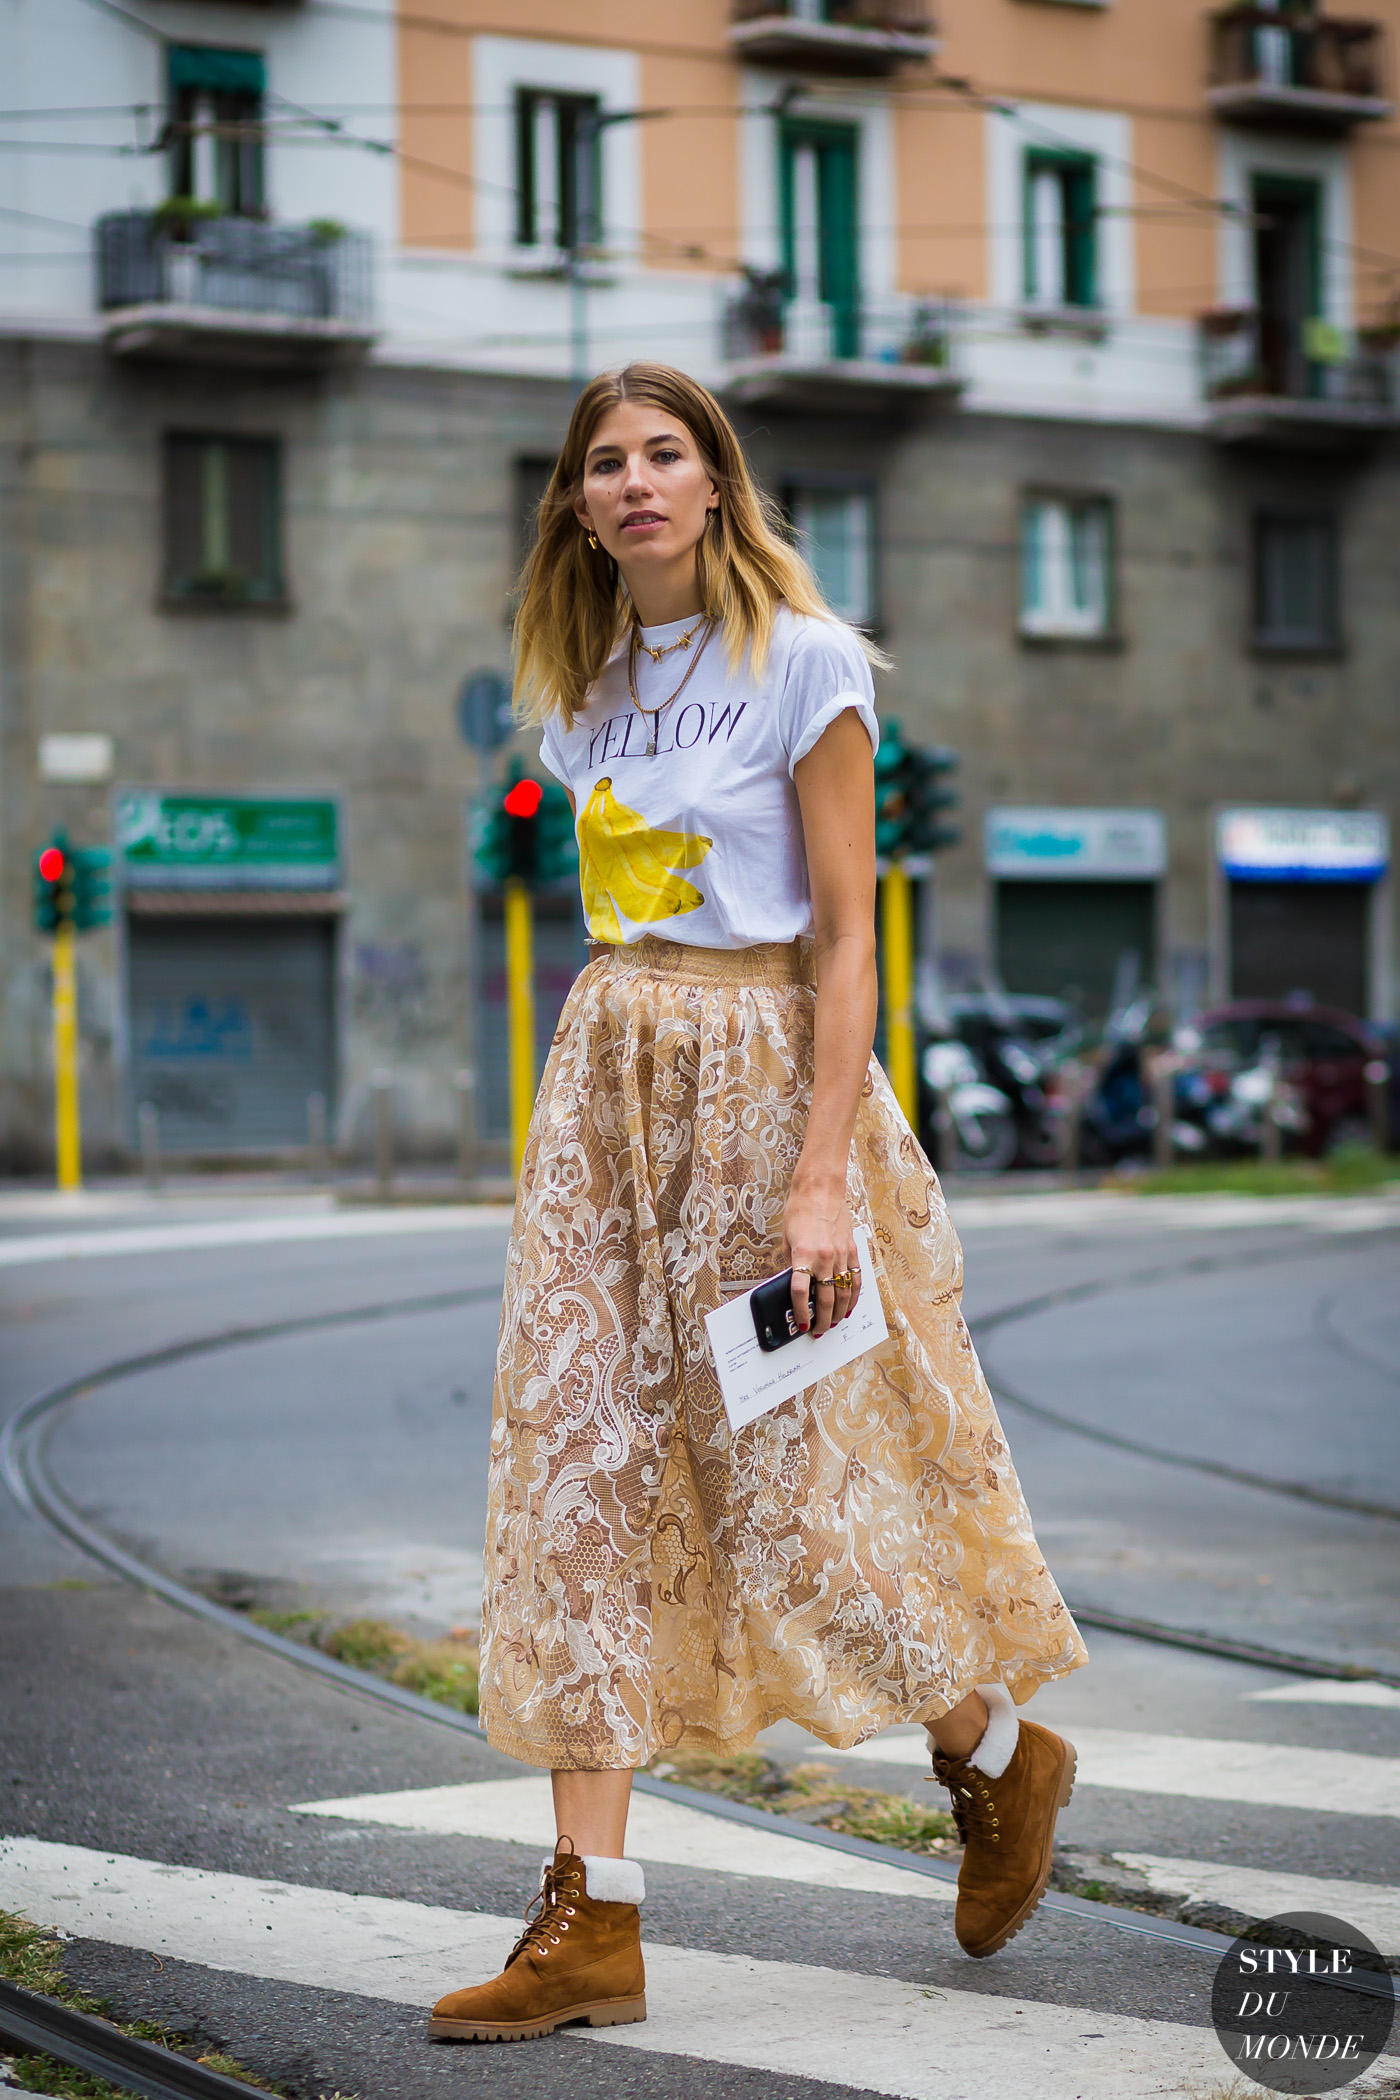 Golden chain necklaces - STYLE DU MONDE | Street Style Street Fashion Photos